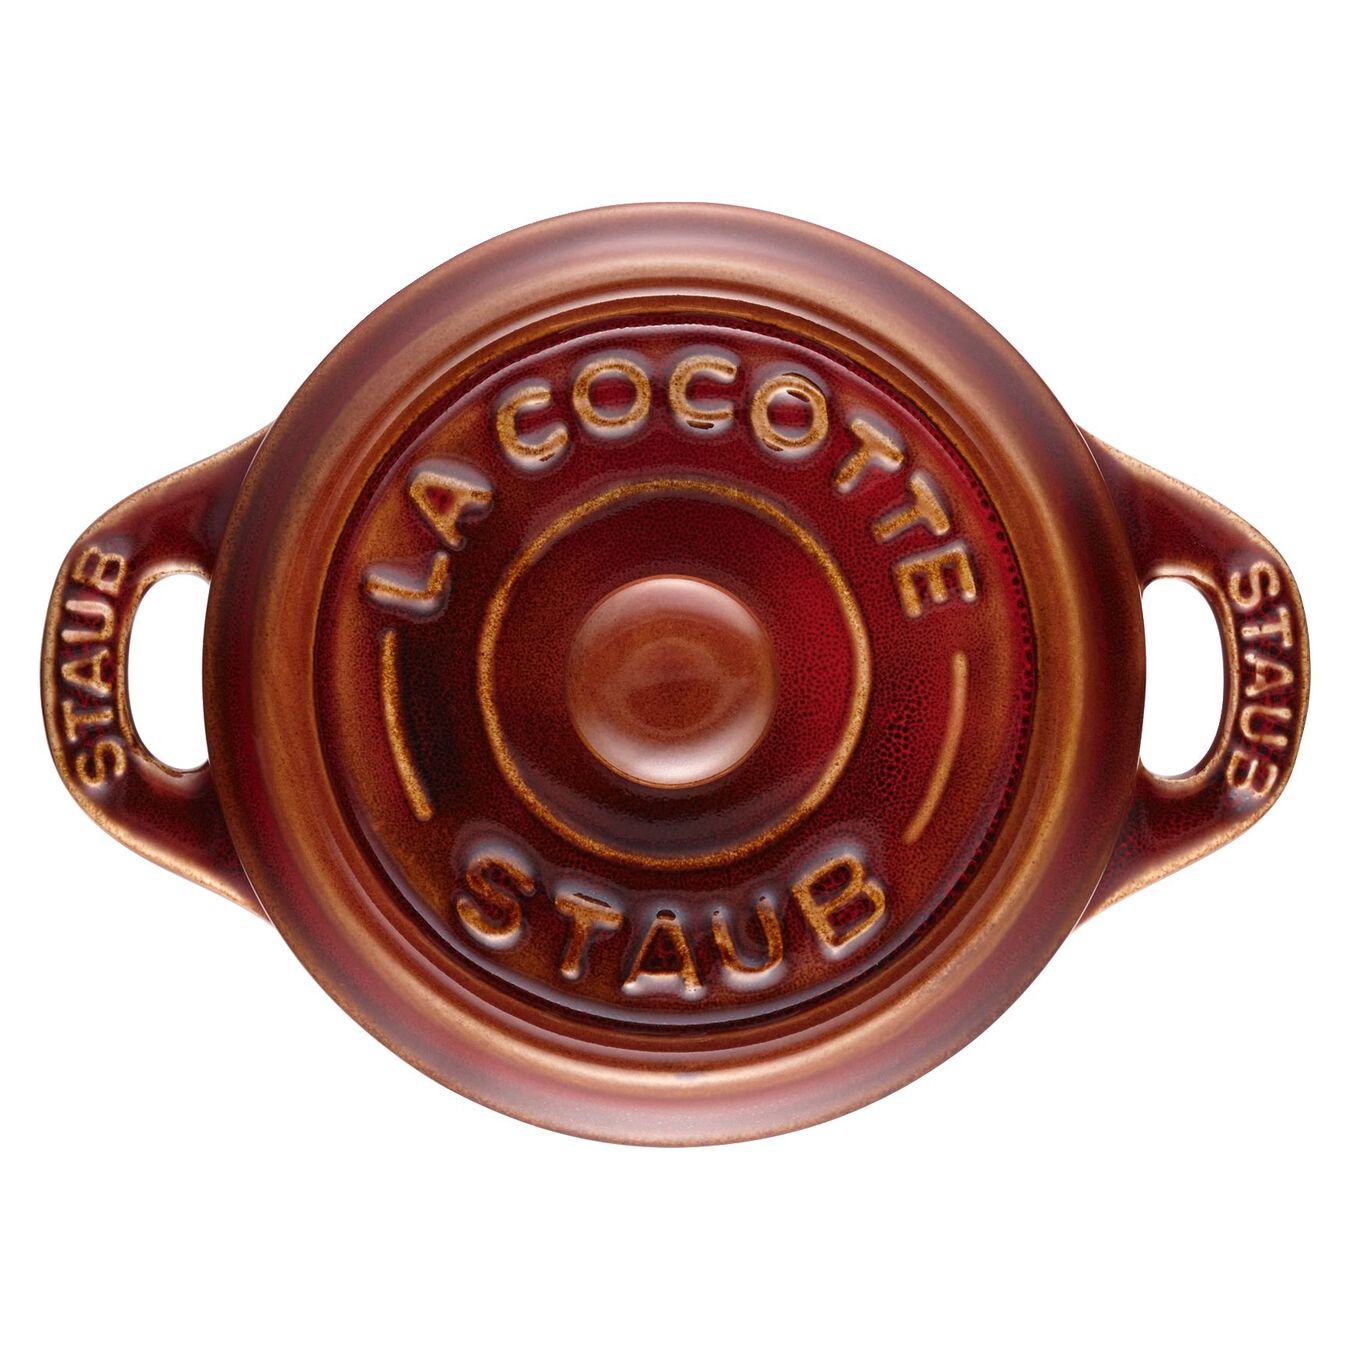 Mini Cocotte 10 cm, rund, Antik-Kupfer, Keramik,,large 5